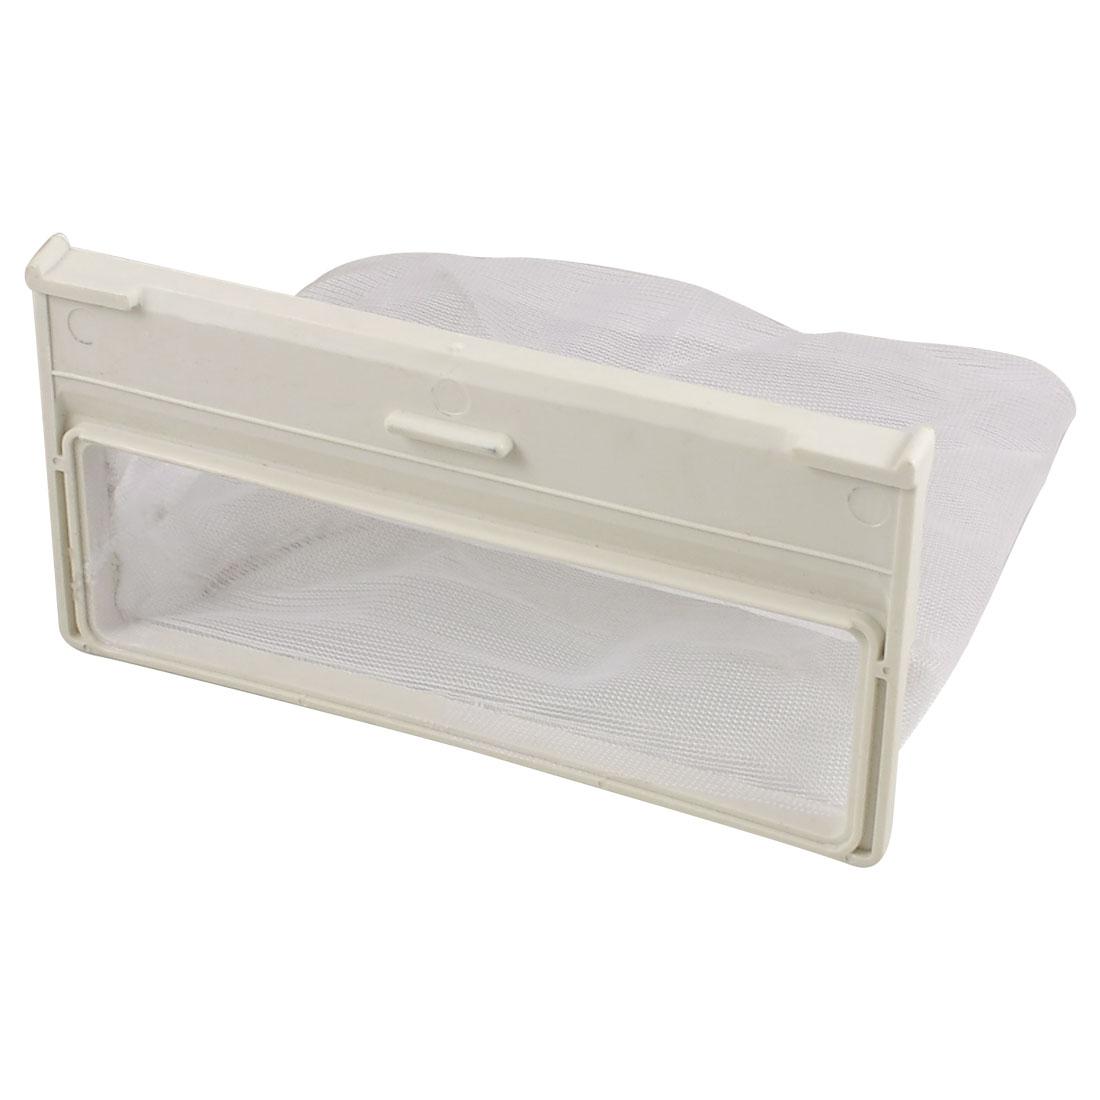 Replacement Washing Machine Laundry Mesh Nylon 14.5cm x 11cm Filter Bag White